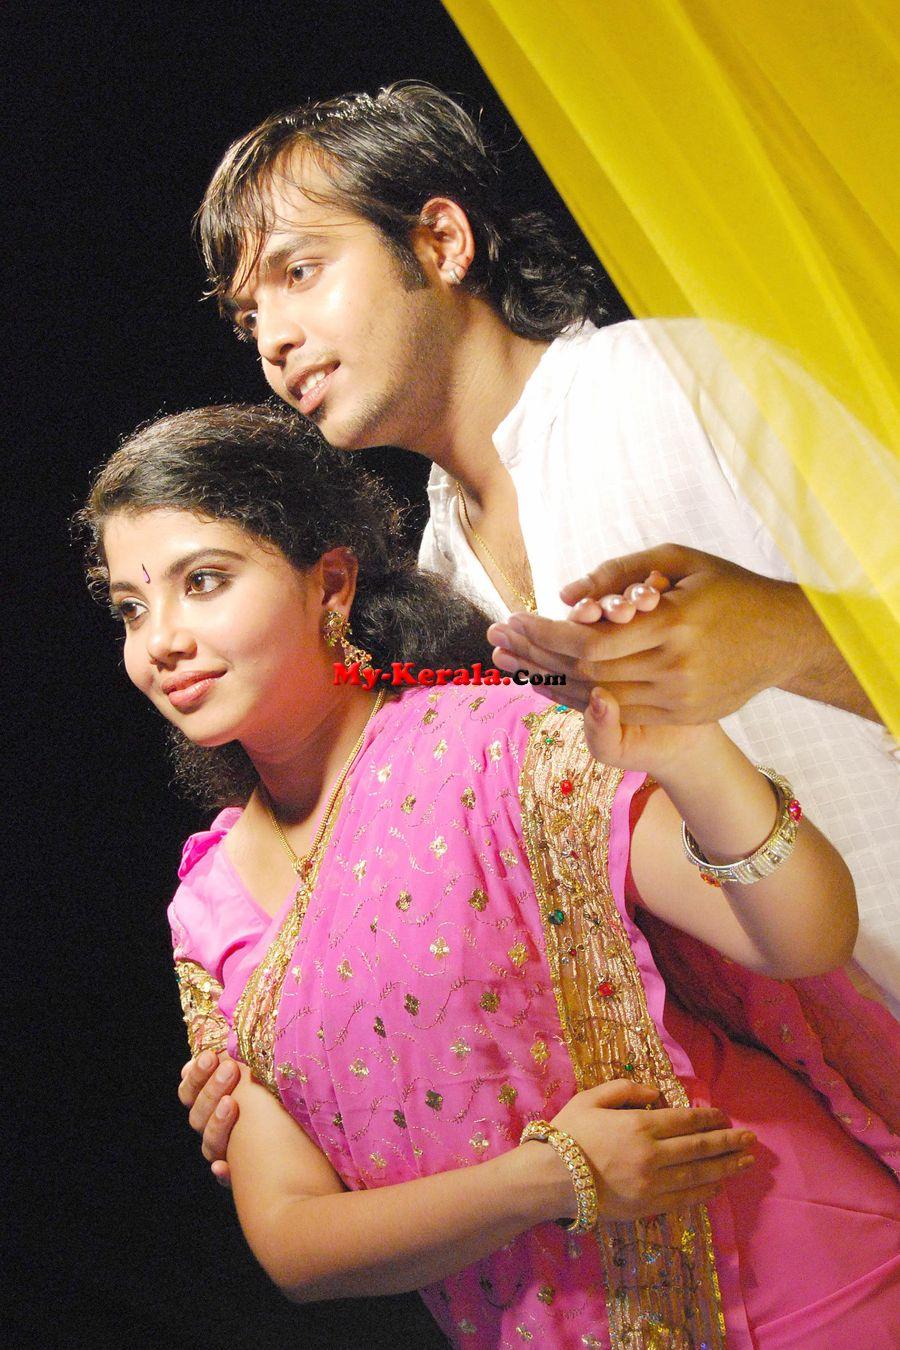 movies,music,downloads: Download Nayanam Songs Malayalam